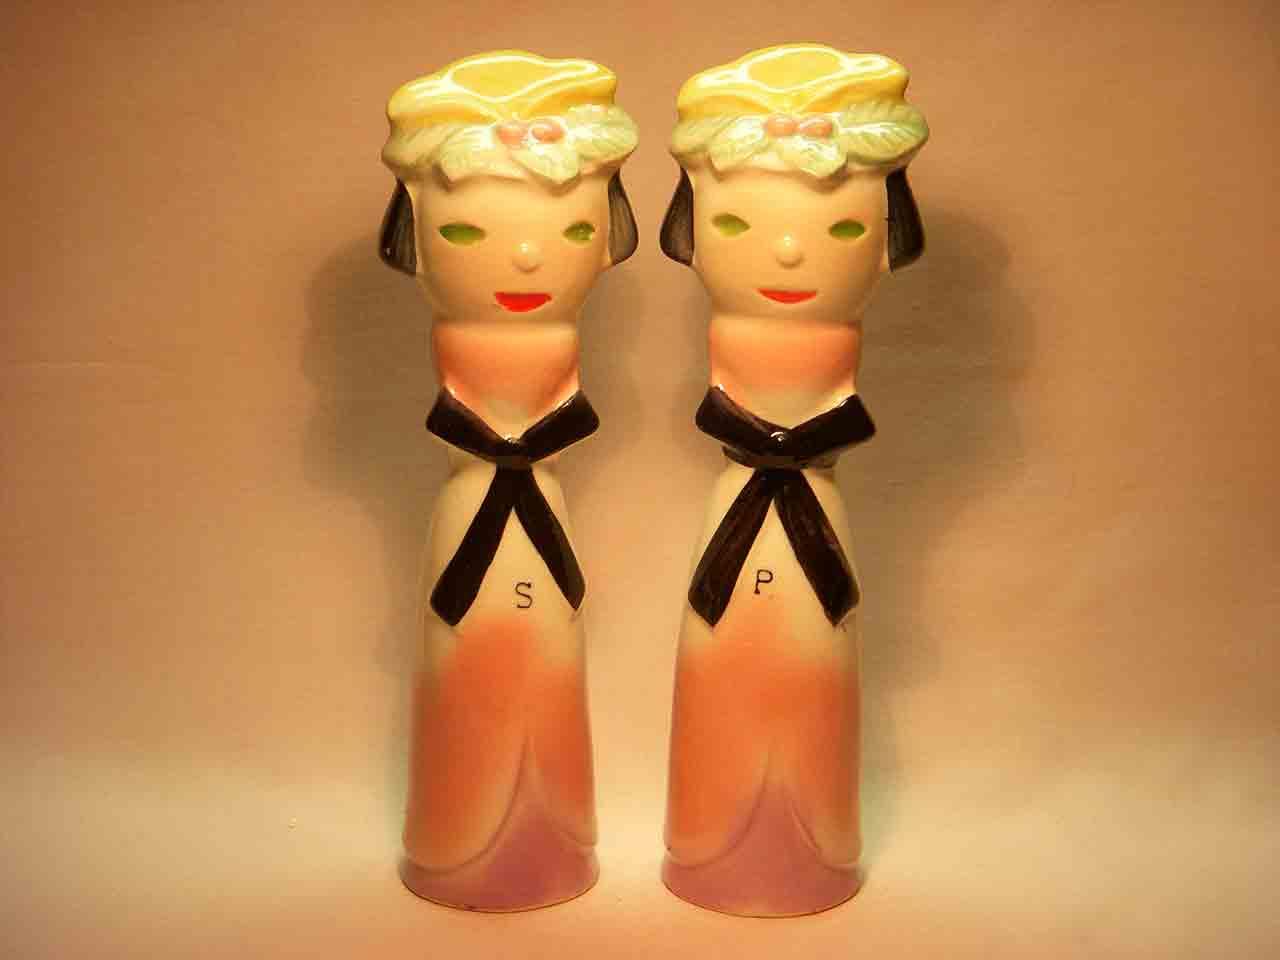 Tallboy ladies salt and pepper shaker